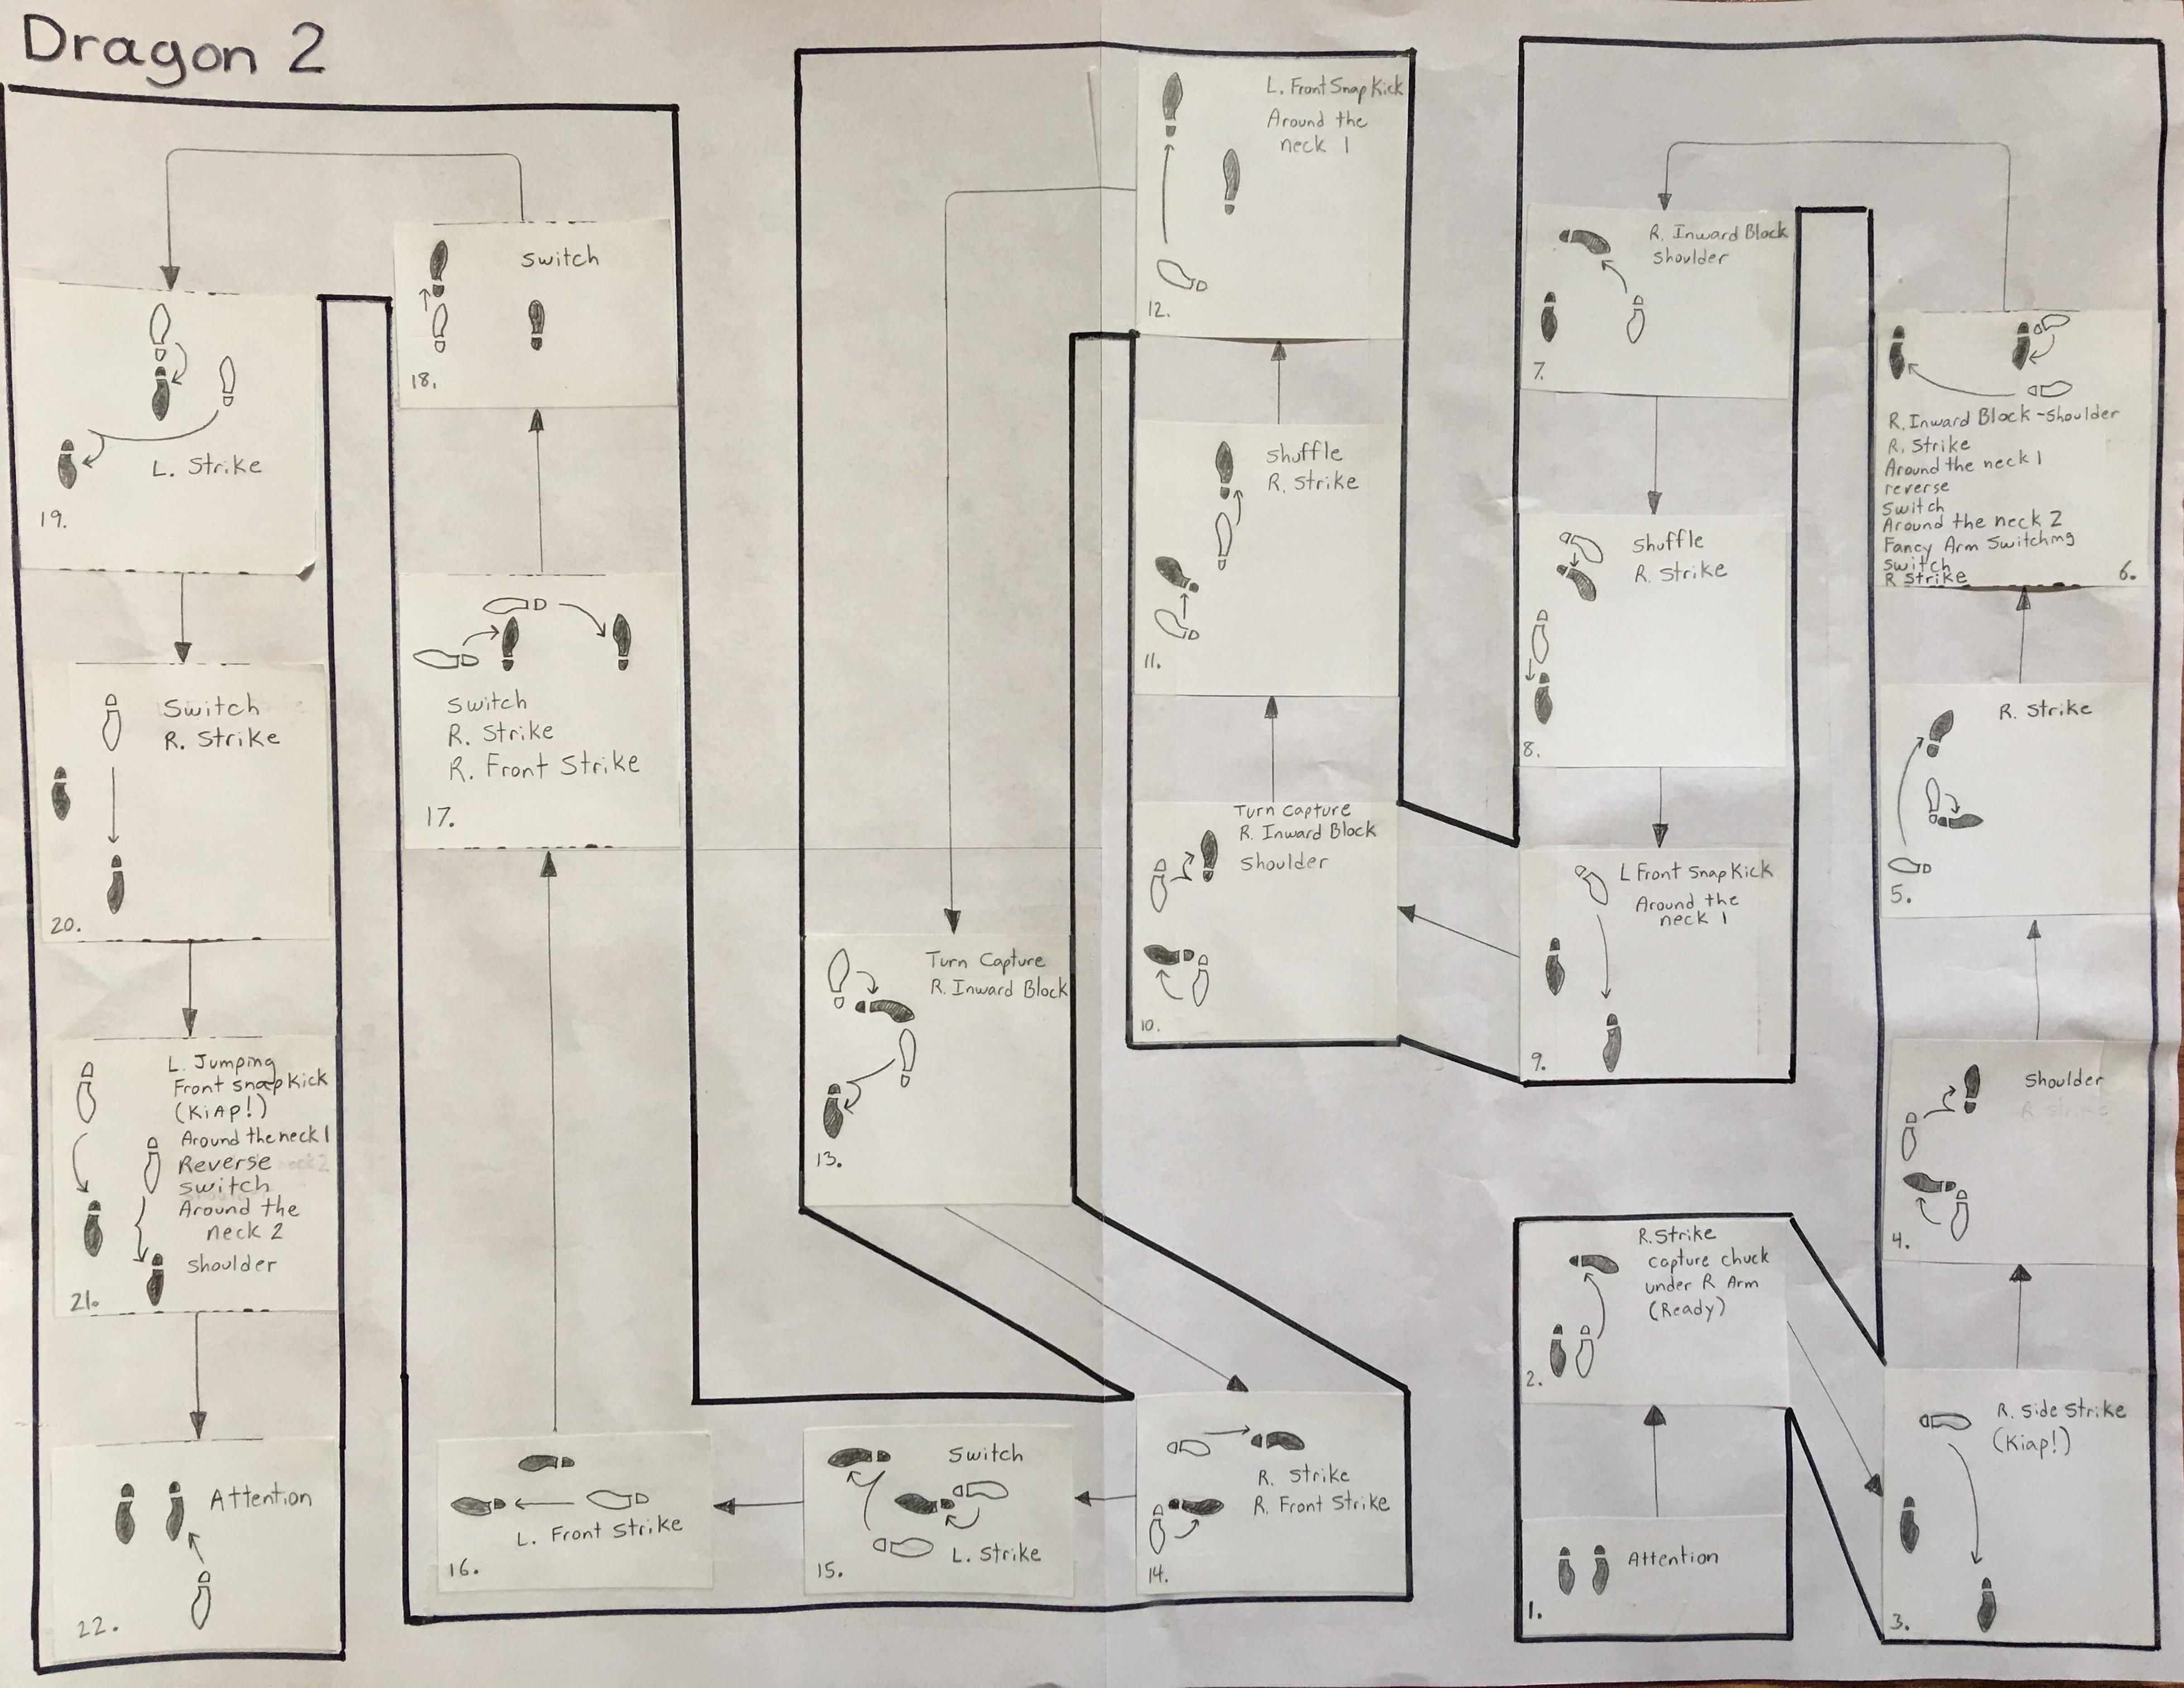 Dragon 2 Diagram